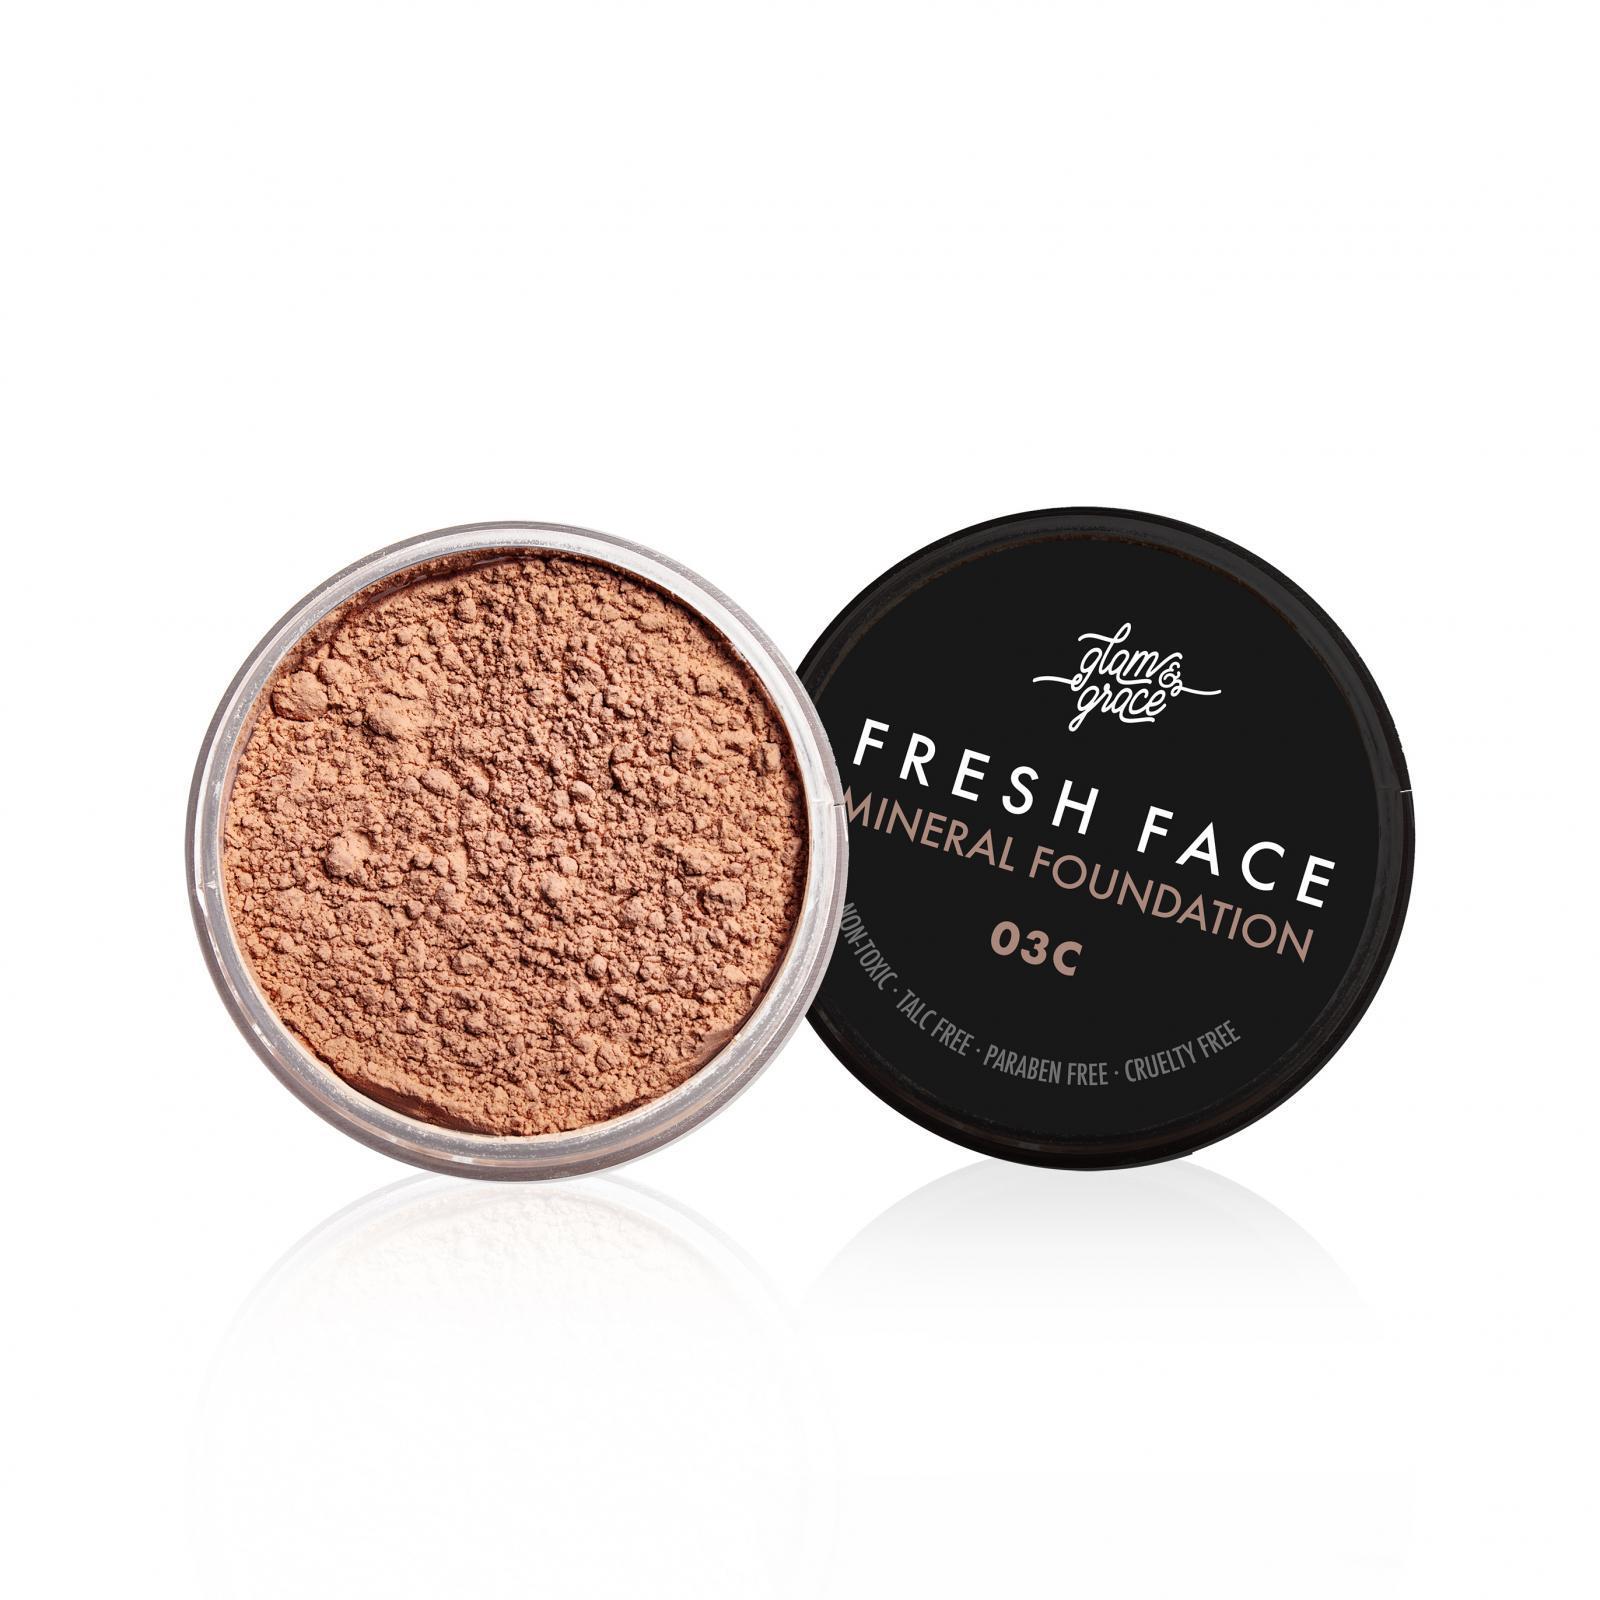 FRESH Face Mineral Foundation Powder - Tan 03C